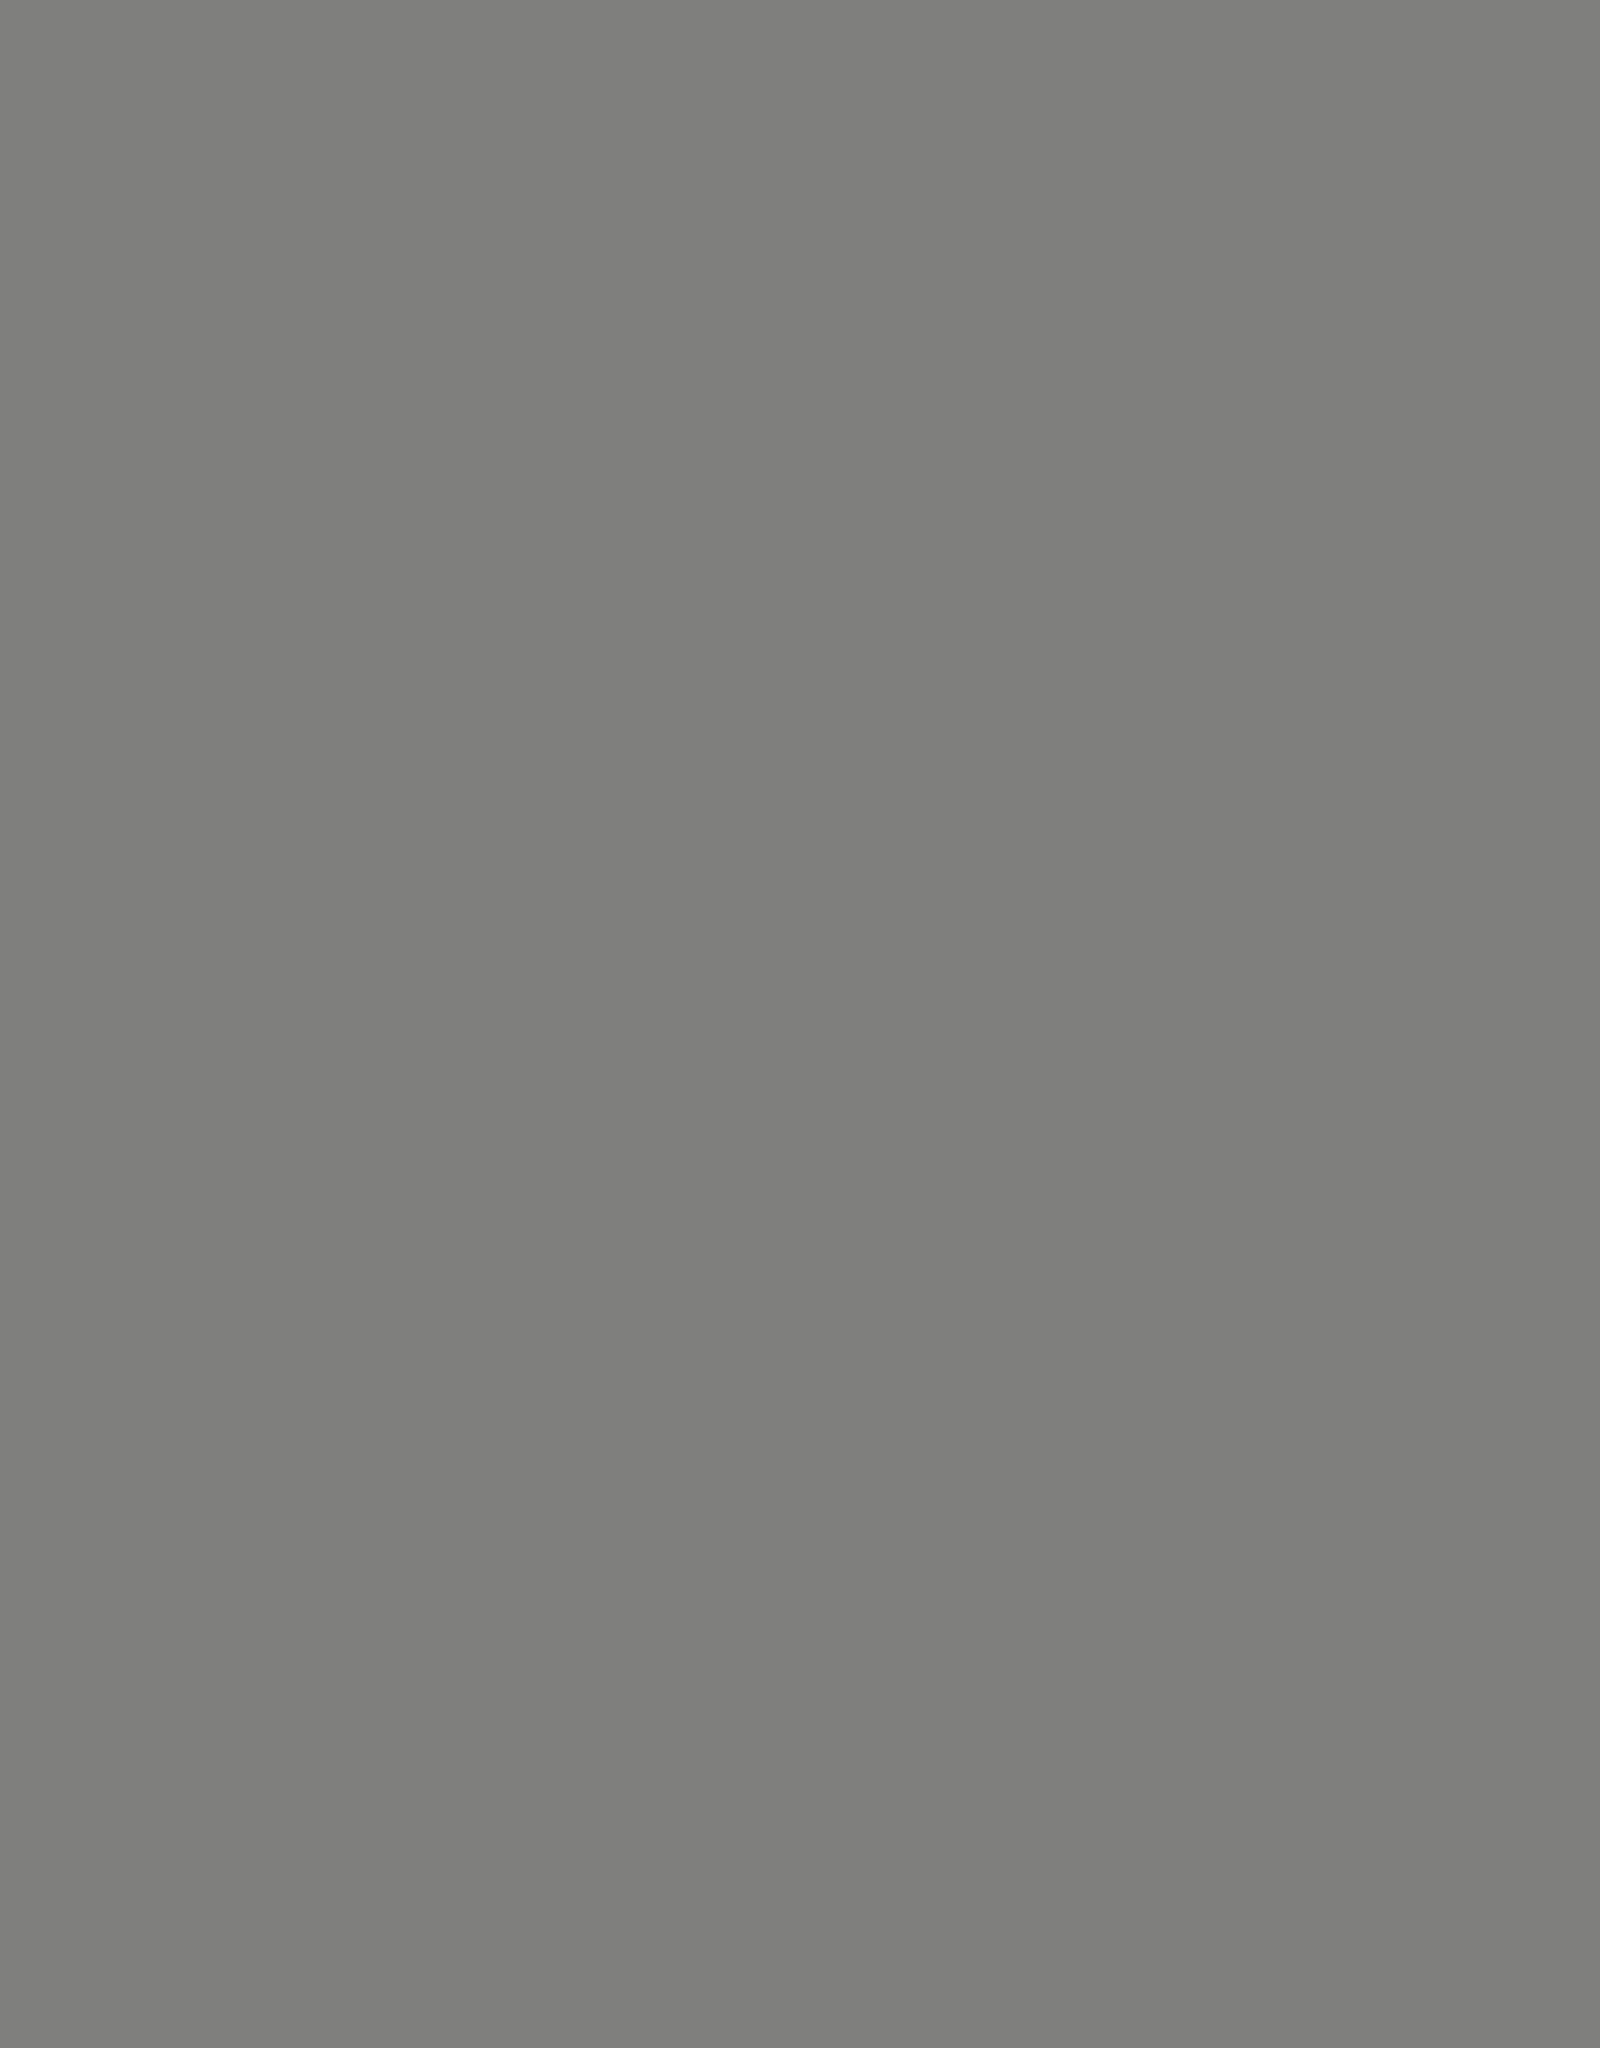 Superior Seamless Superior Seamless 9' Neutral Grey #04